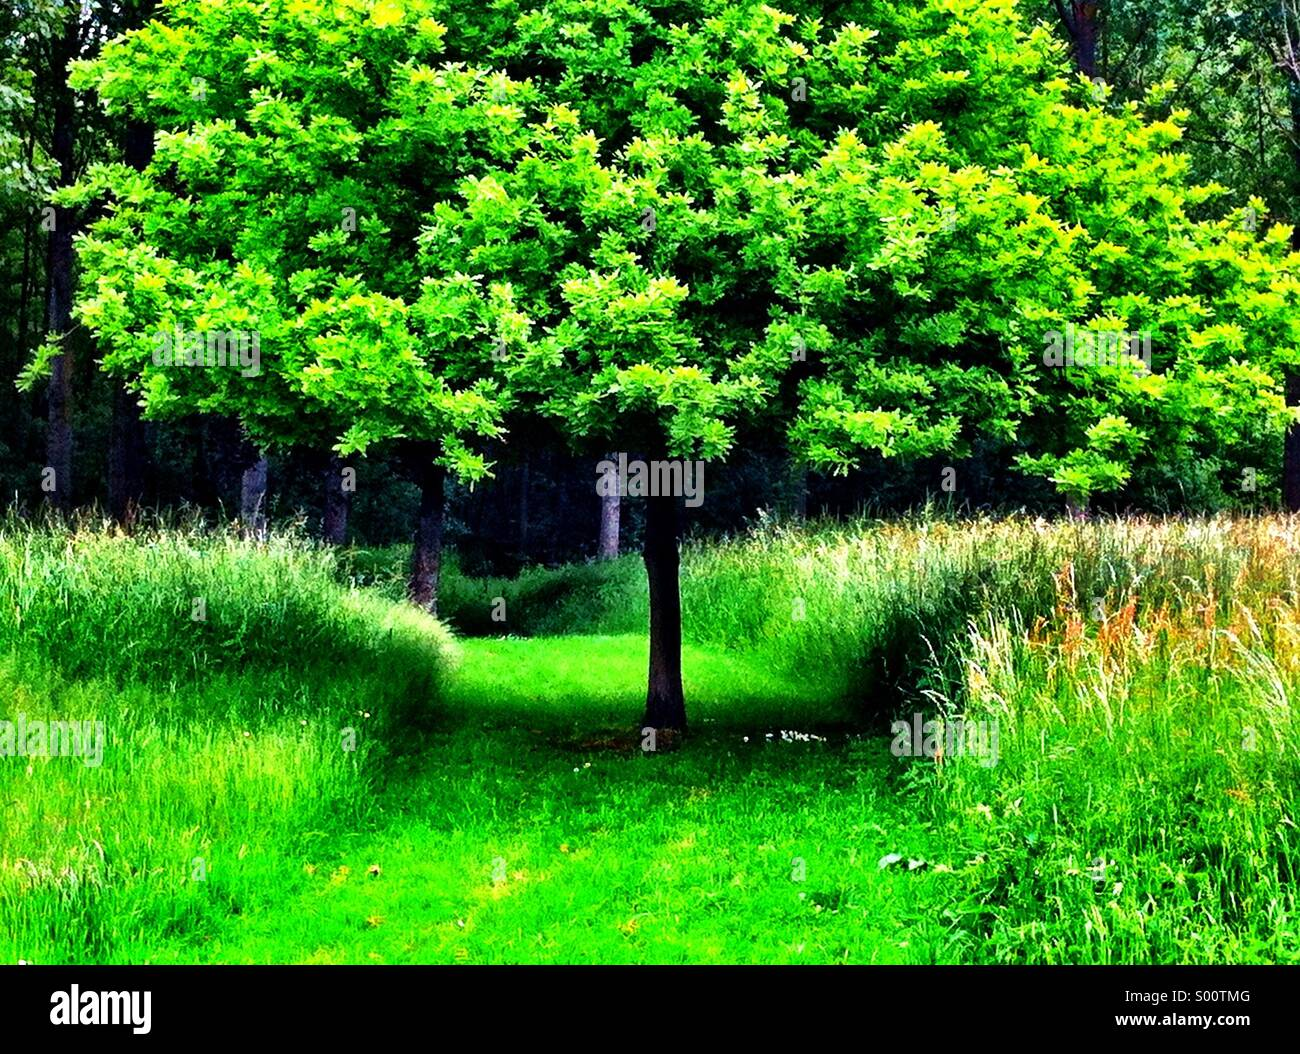 Green Tree - Stock Image